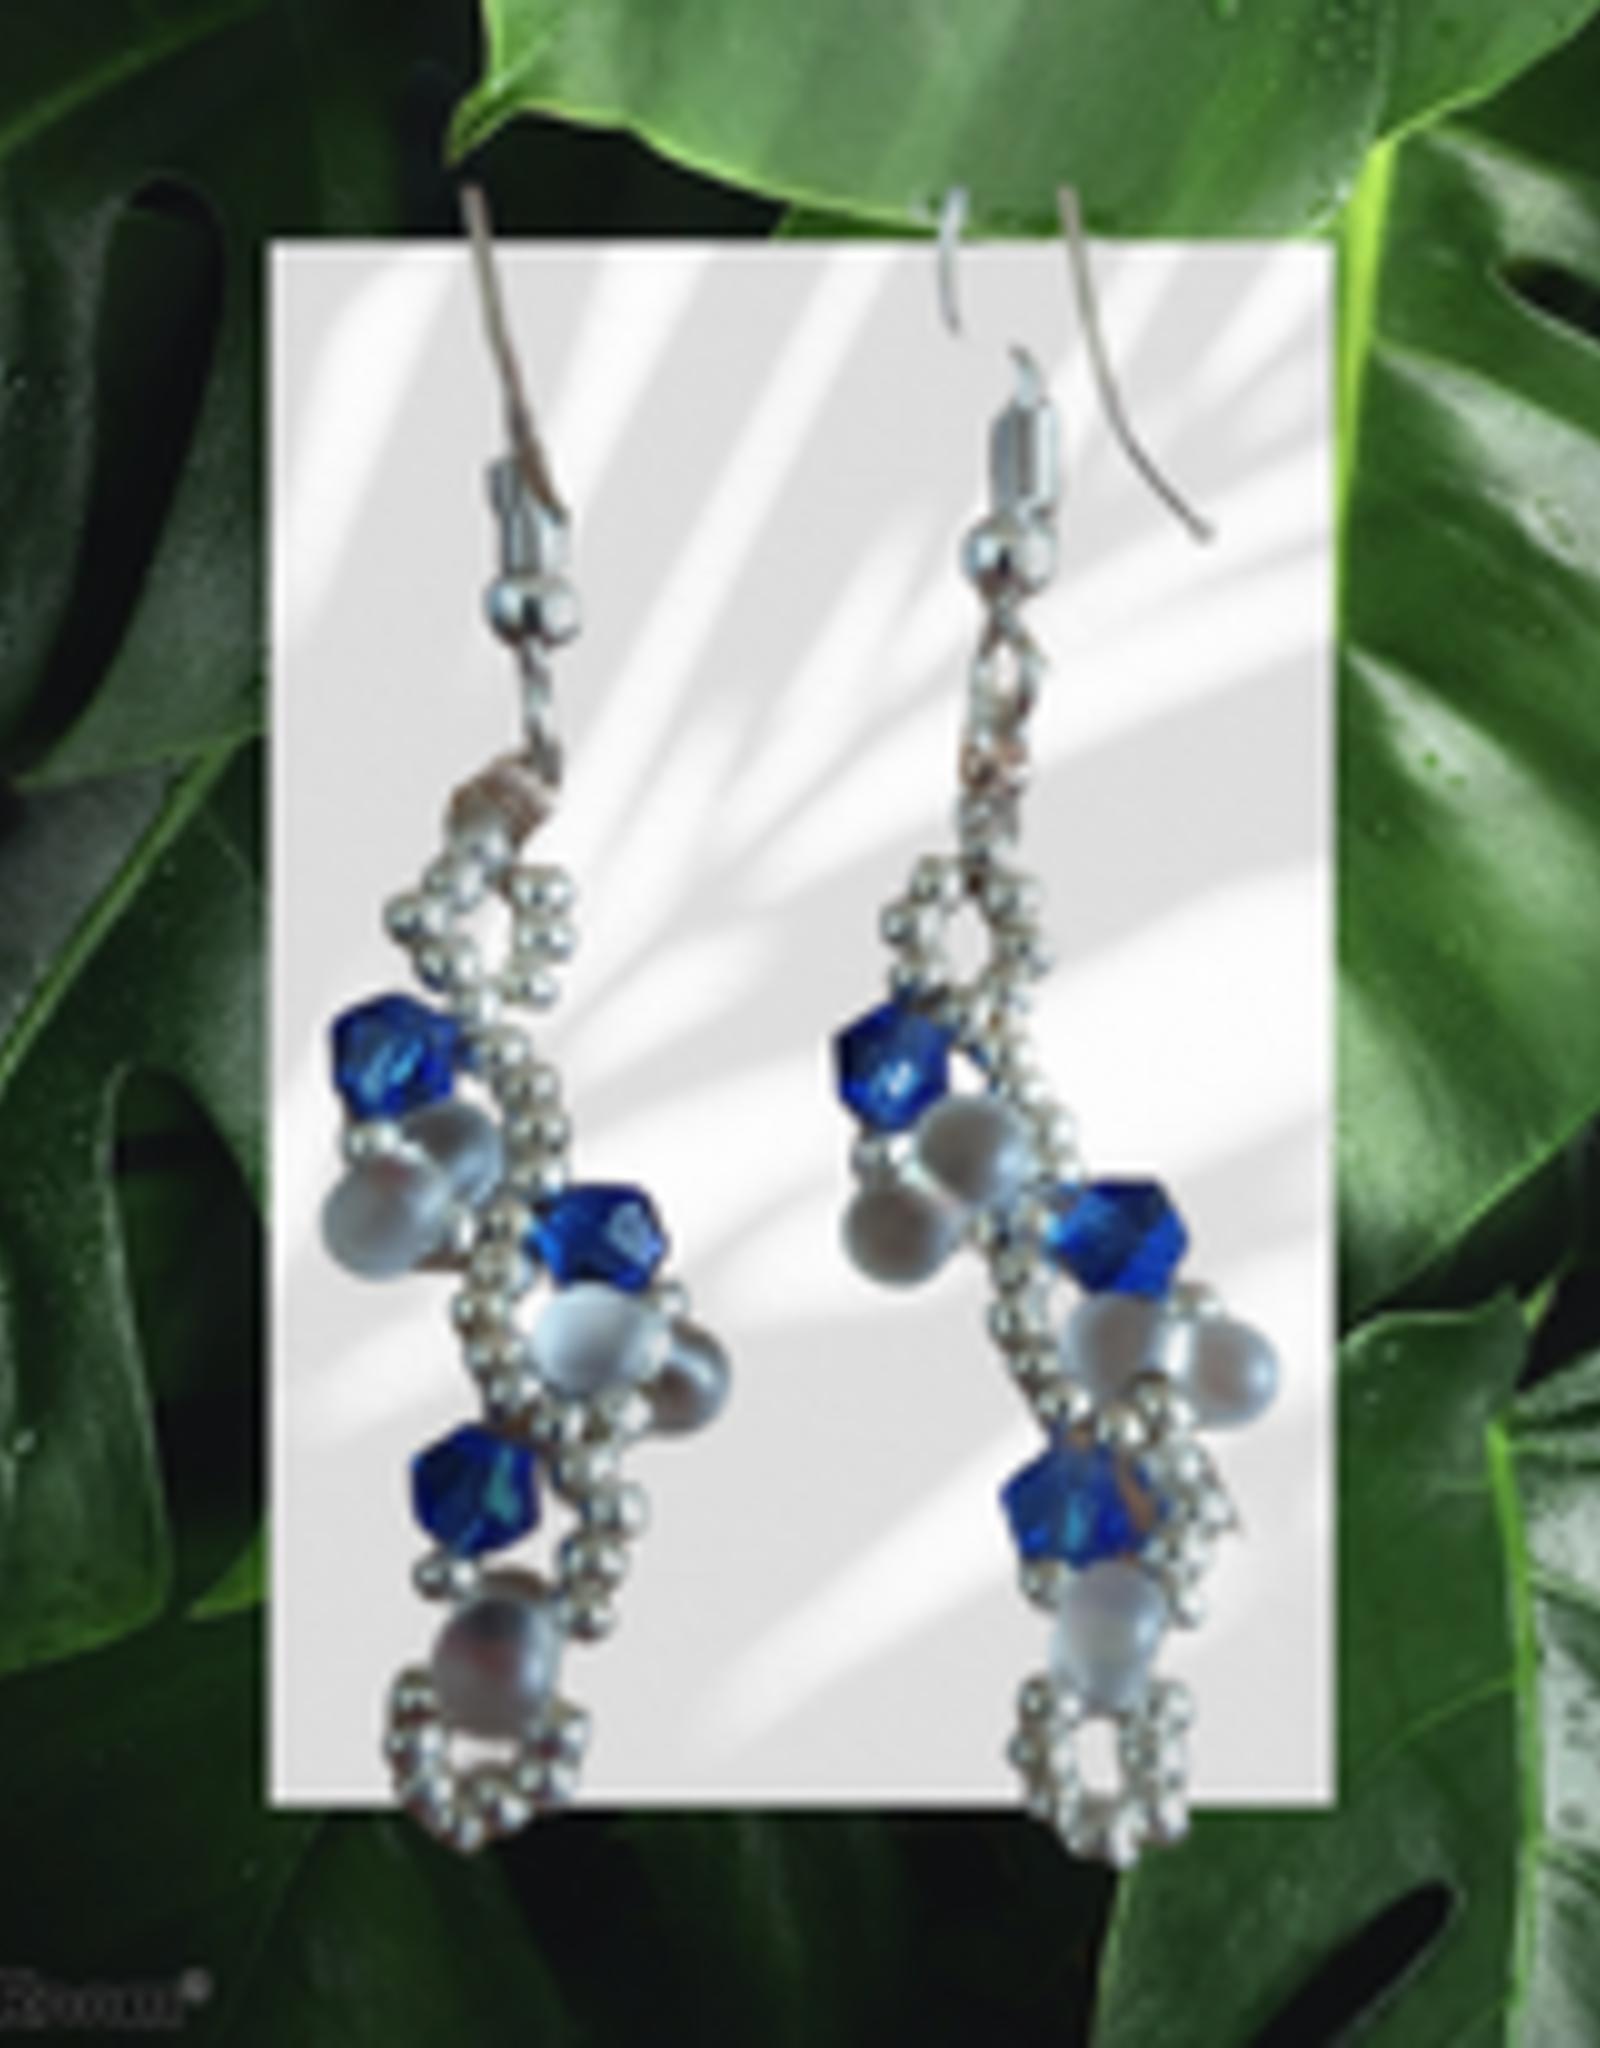 seazido - wevyra swarovski oorringen  Blauw s-vormig  kort